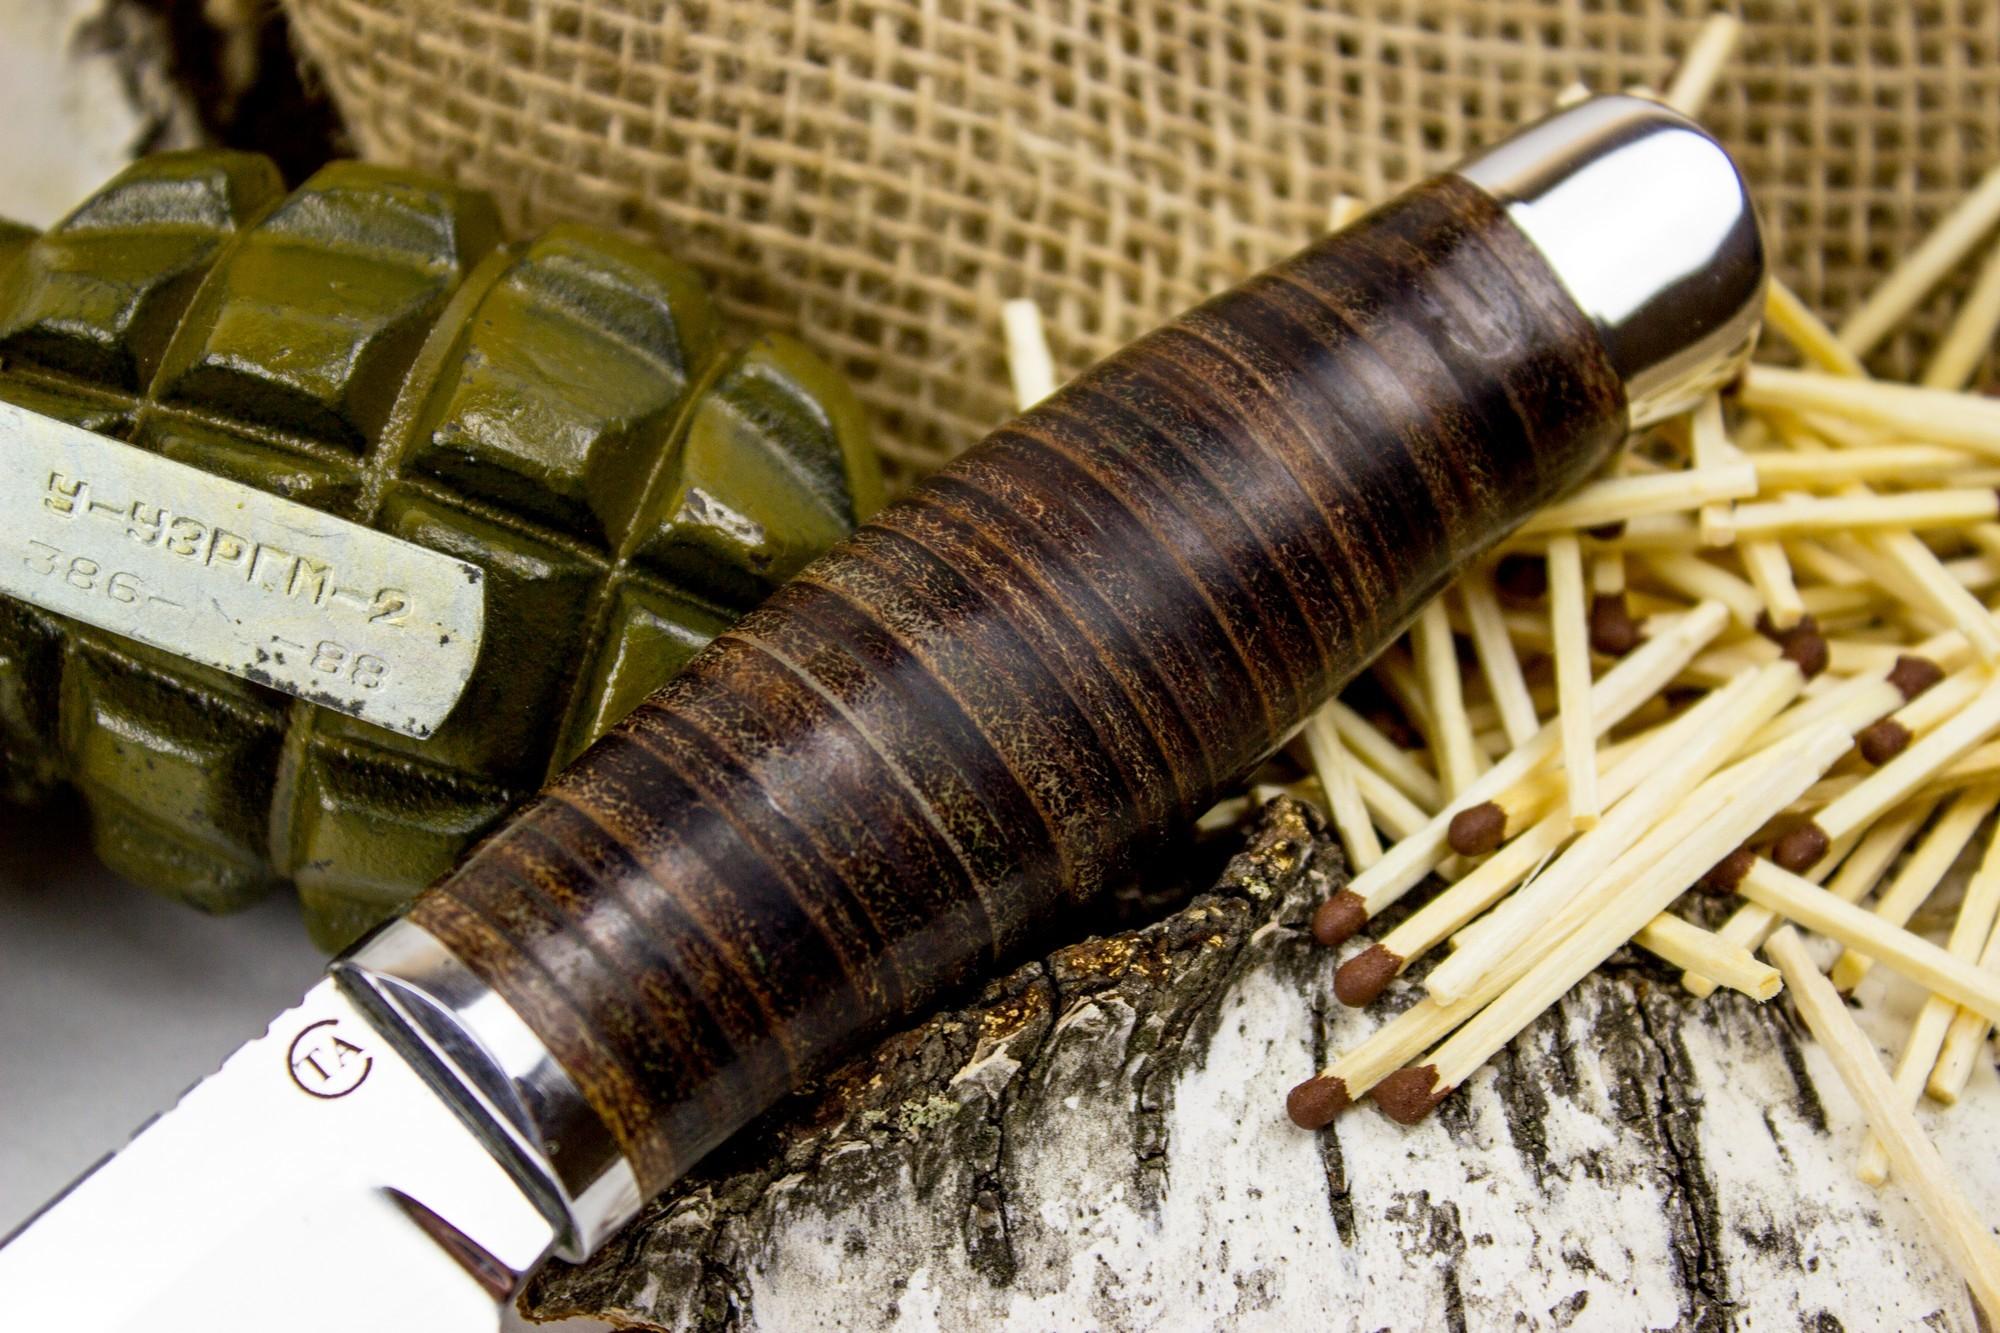 Фото 8 - Нож Гюрза-3, сталь 95х18 от Титов и Солдатова